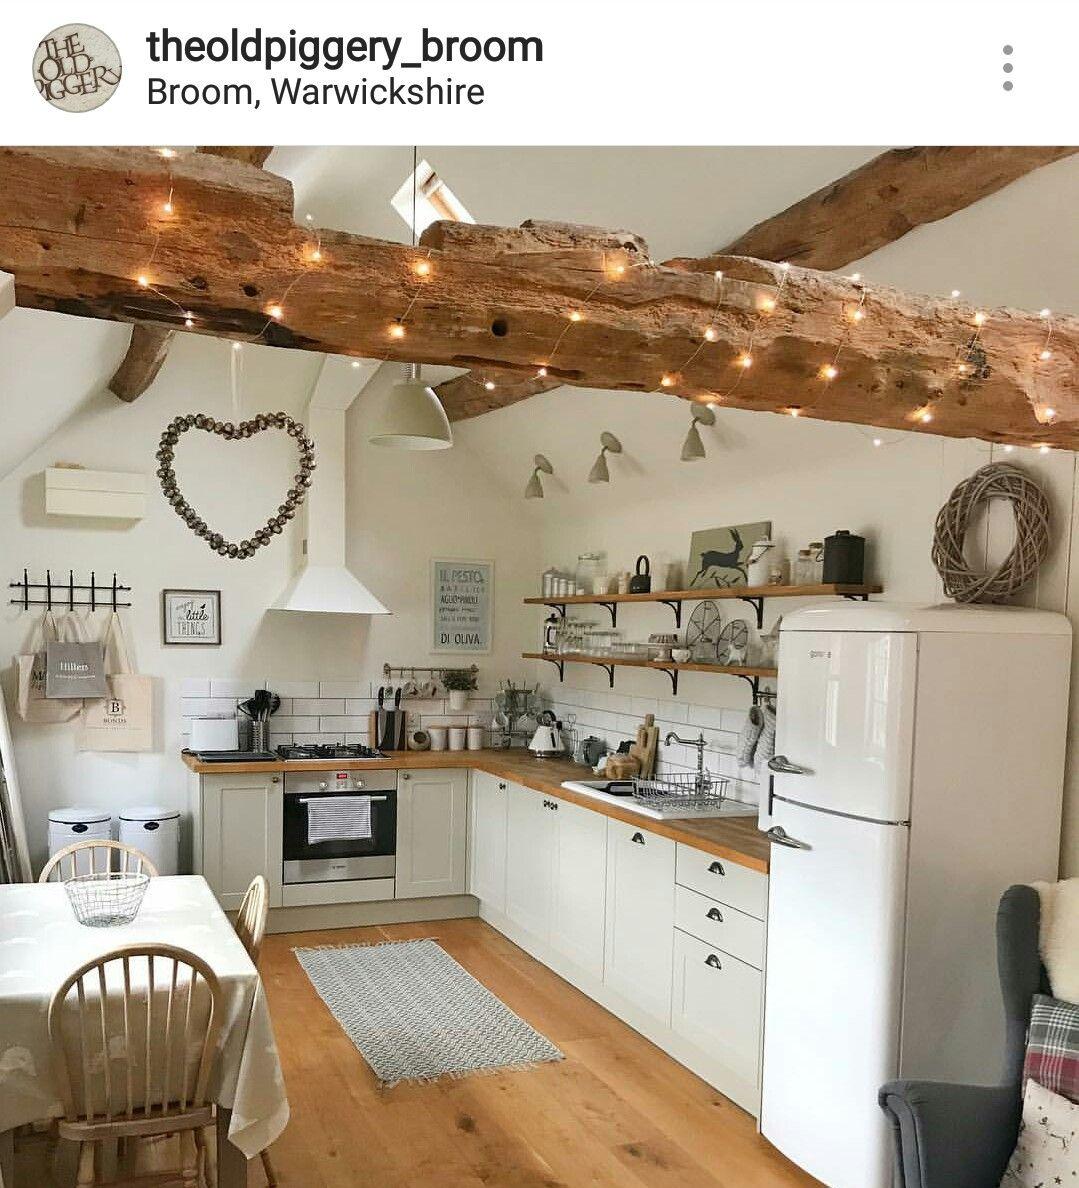 Dainty kitchen. Love. #countertop